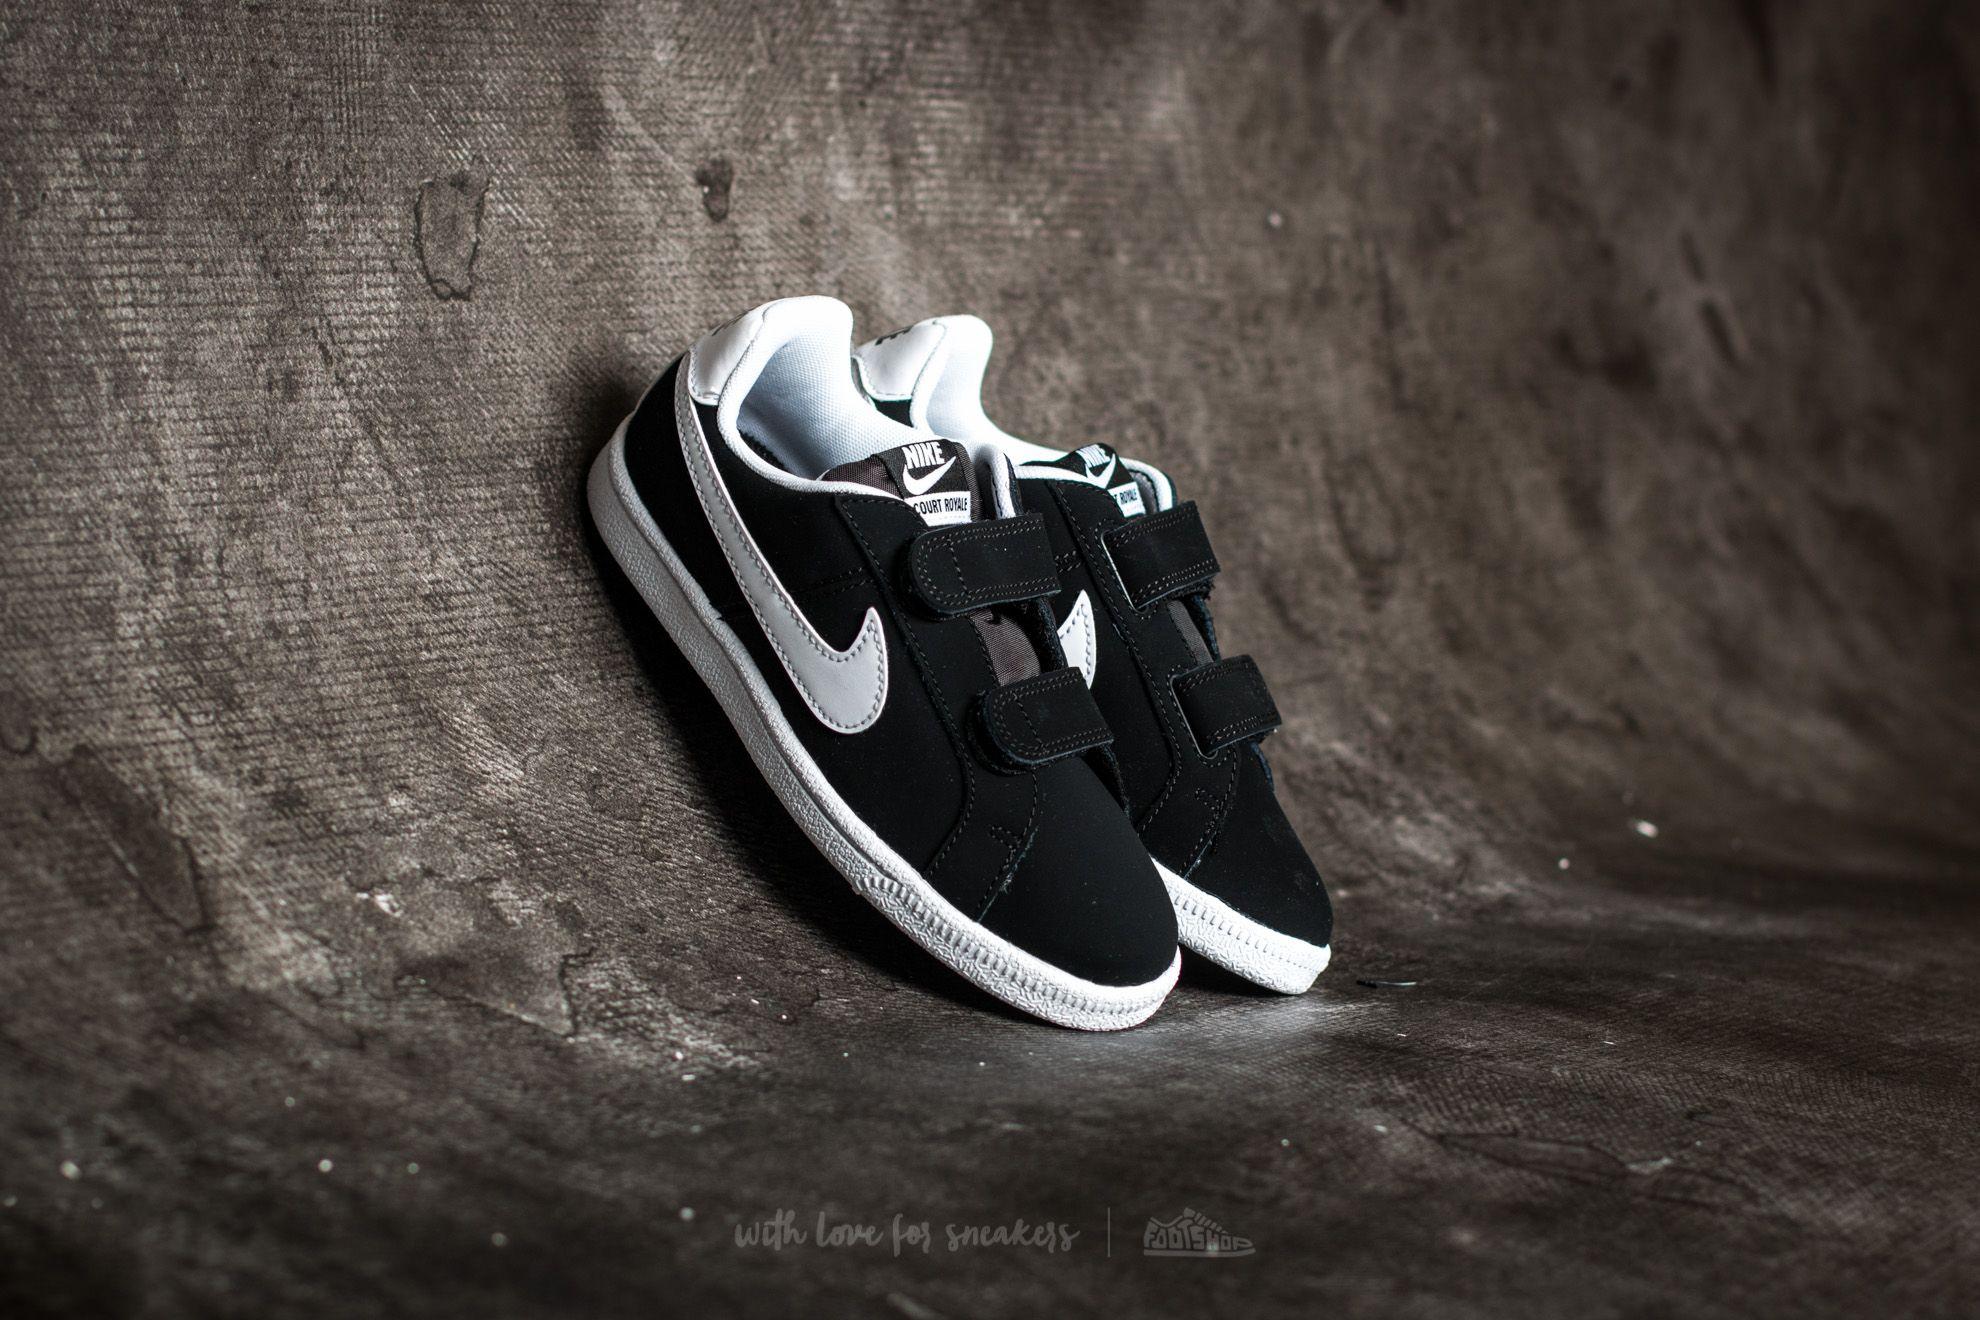 6c8cbbda140 Nike Court Royale (PSV) Black  White